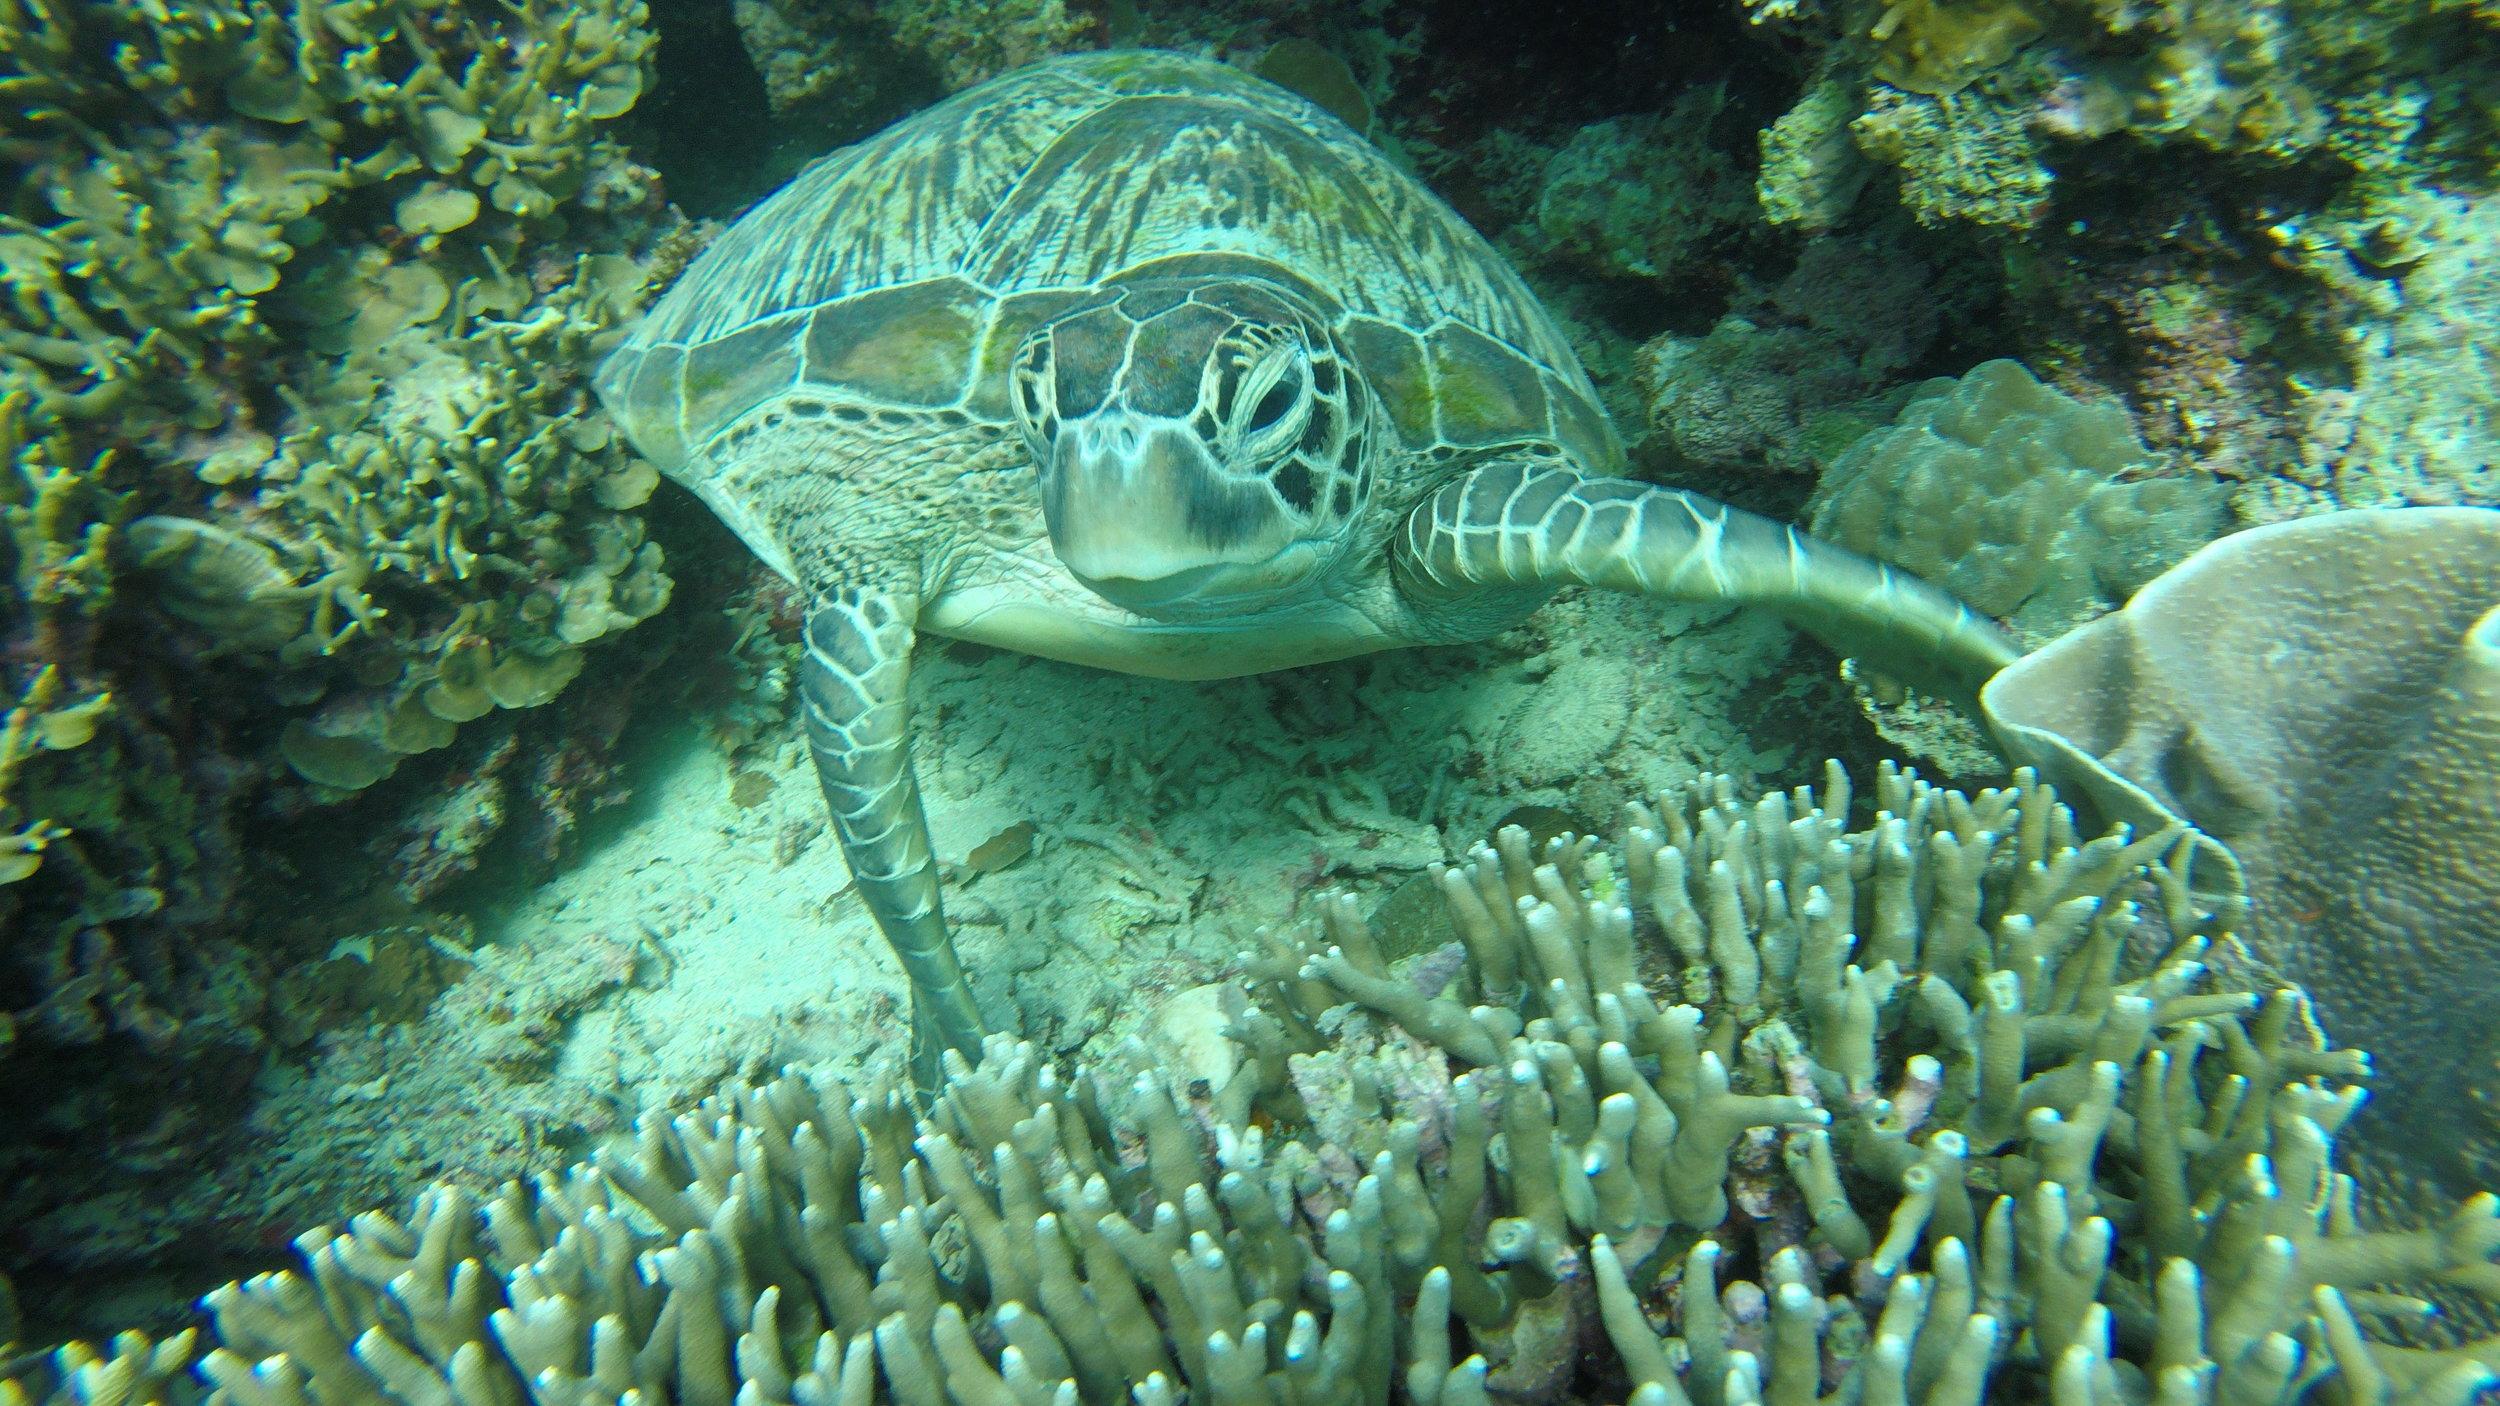 we found a turtle!